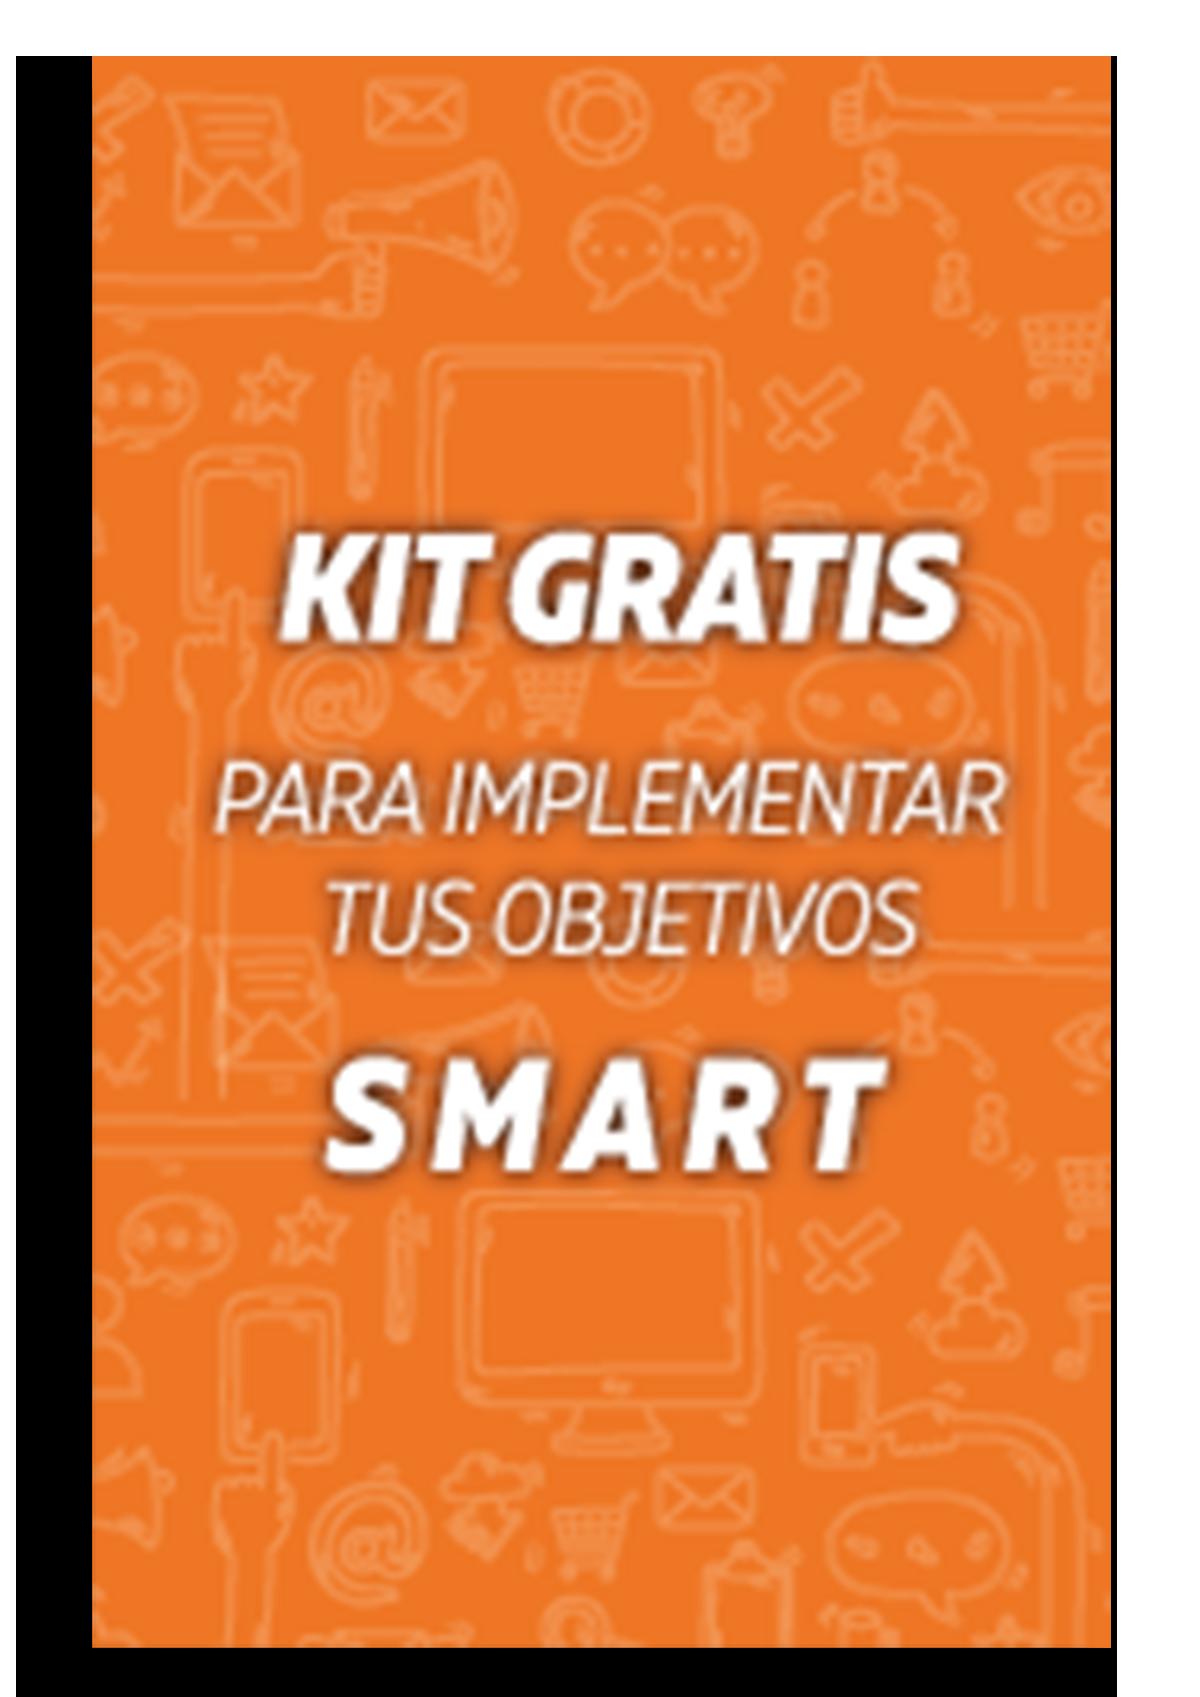 2 Objetivos smart